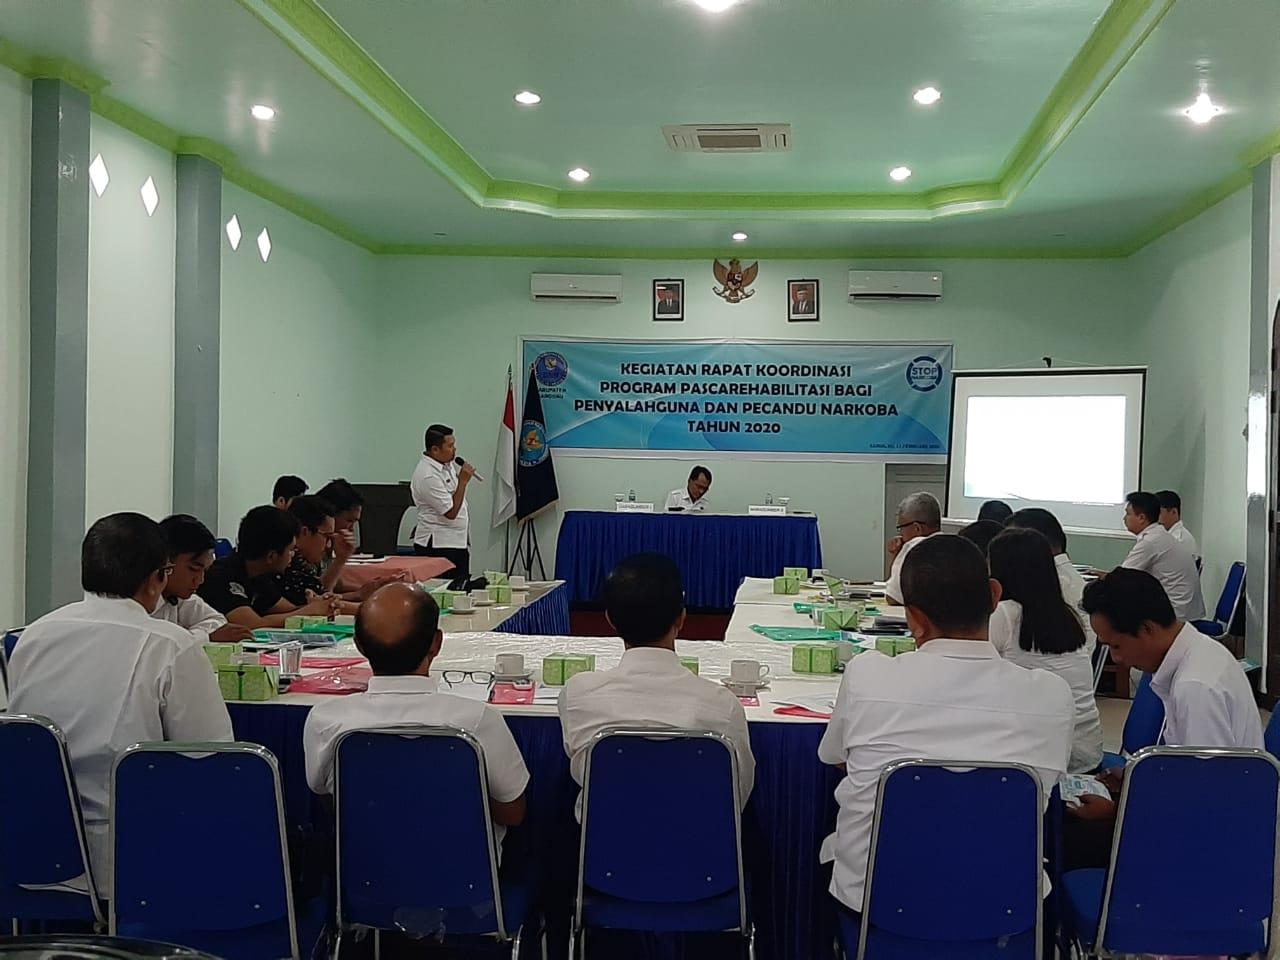 Foto--Suasana Rakor Lintas Sektoral BNNK Sanggau, menyamakan persepsi penyusunan program pasca rehabilitasi, Rabu (12/2/2020) di Hotel Meldy Sanggau---istimewa